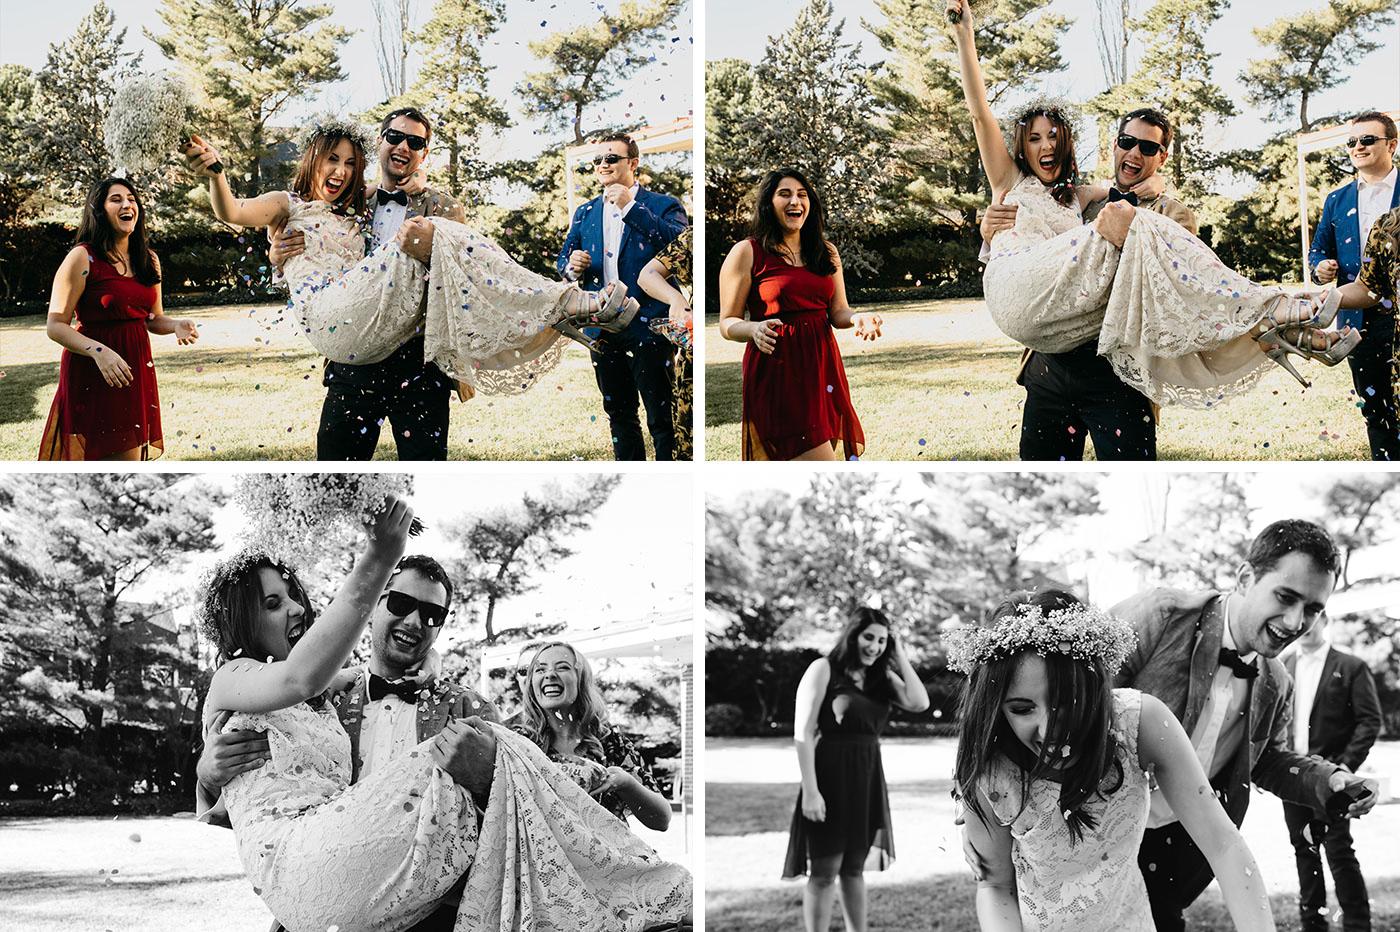 Velvet-Hush-fotografos-boda-al-aire-libre-madrid-043